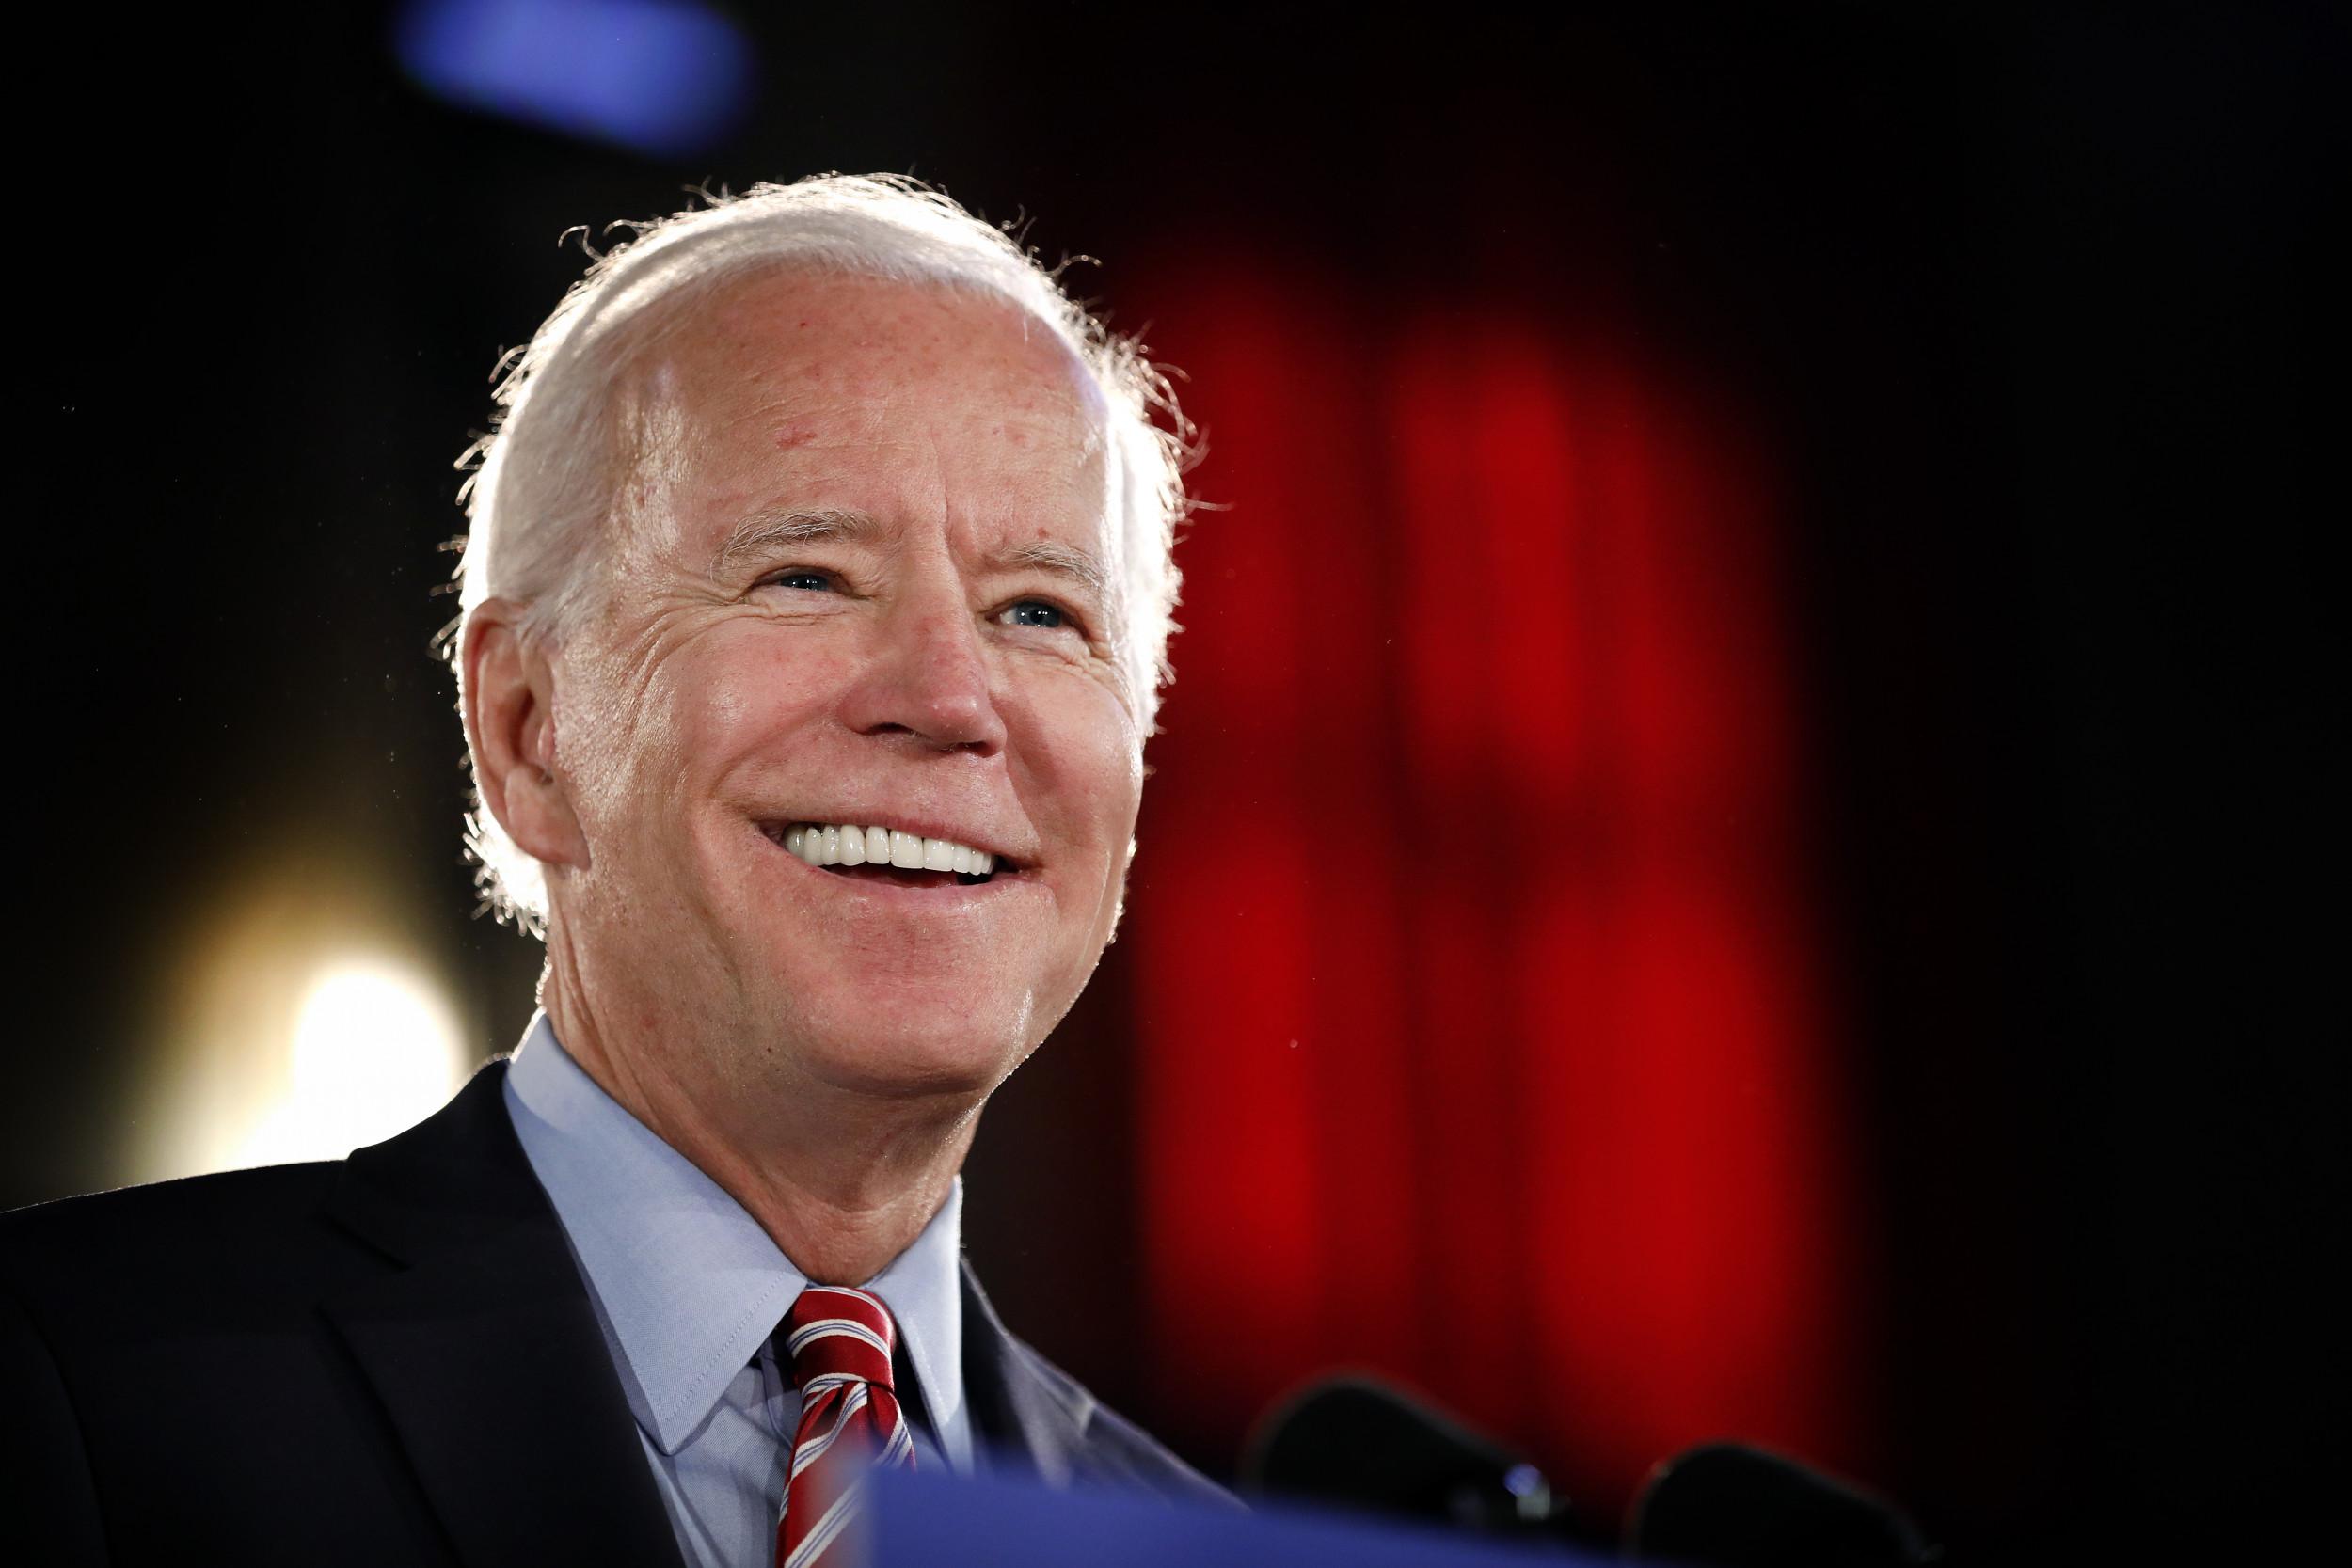 Biden Harris Pence Fly Swatter 2020 Debate